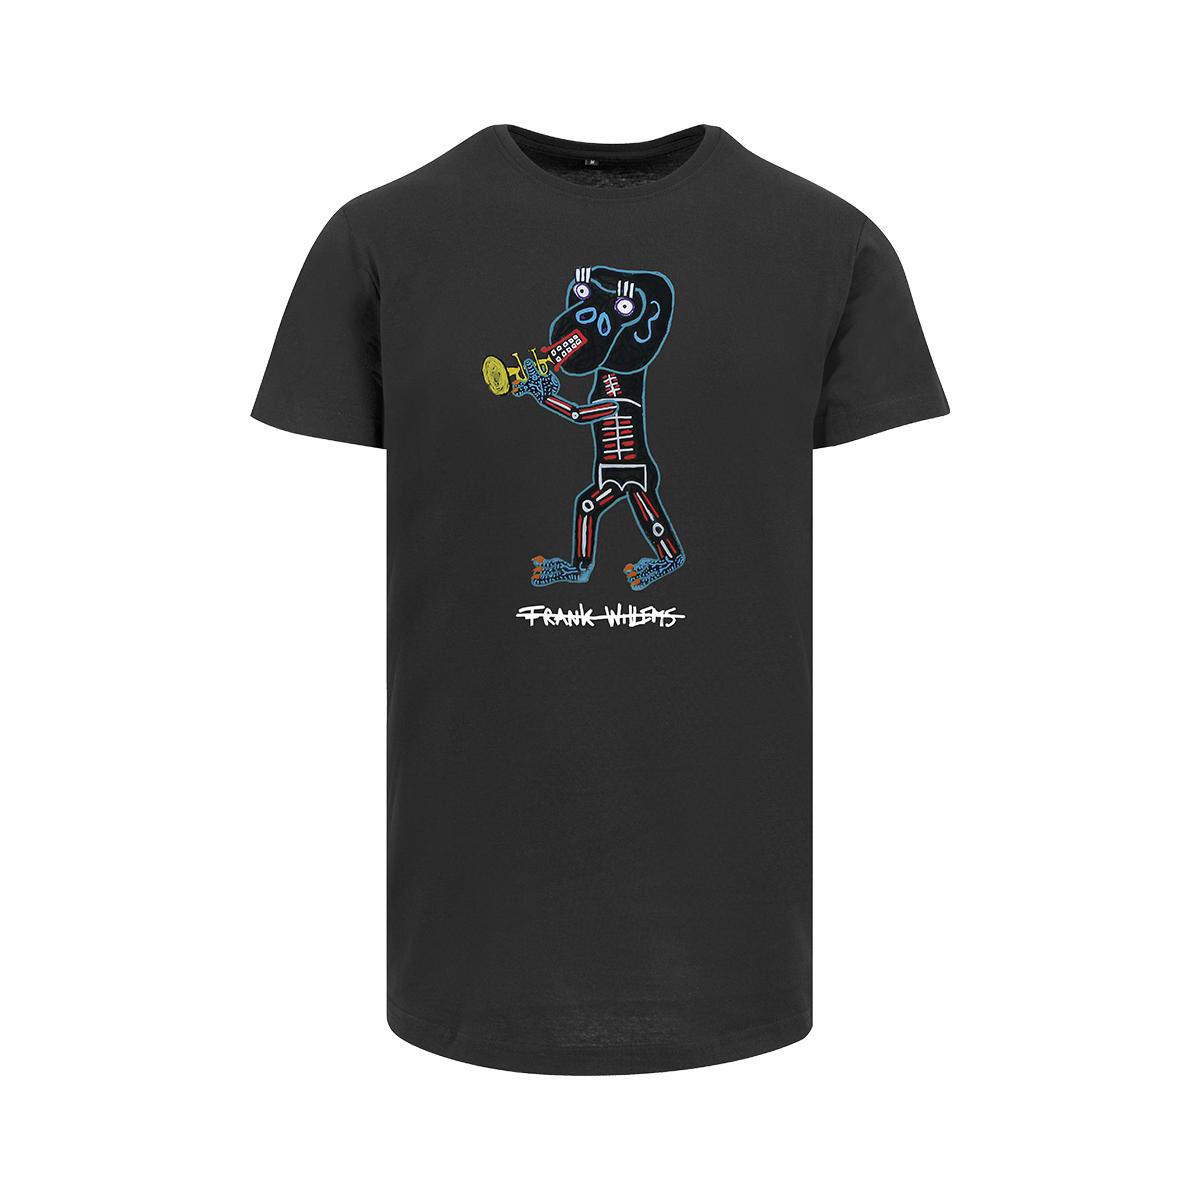 Frank Willems - Longfit T-shirt - EL MONO TROMPETISTA - BLK